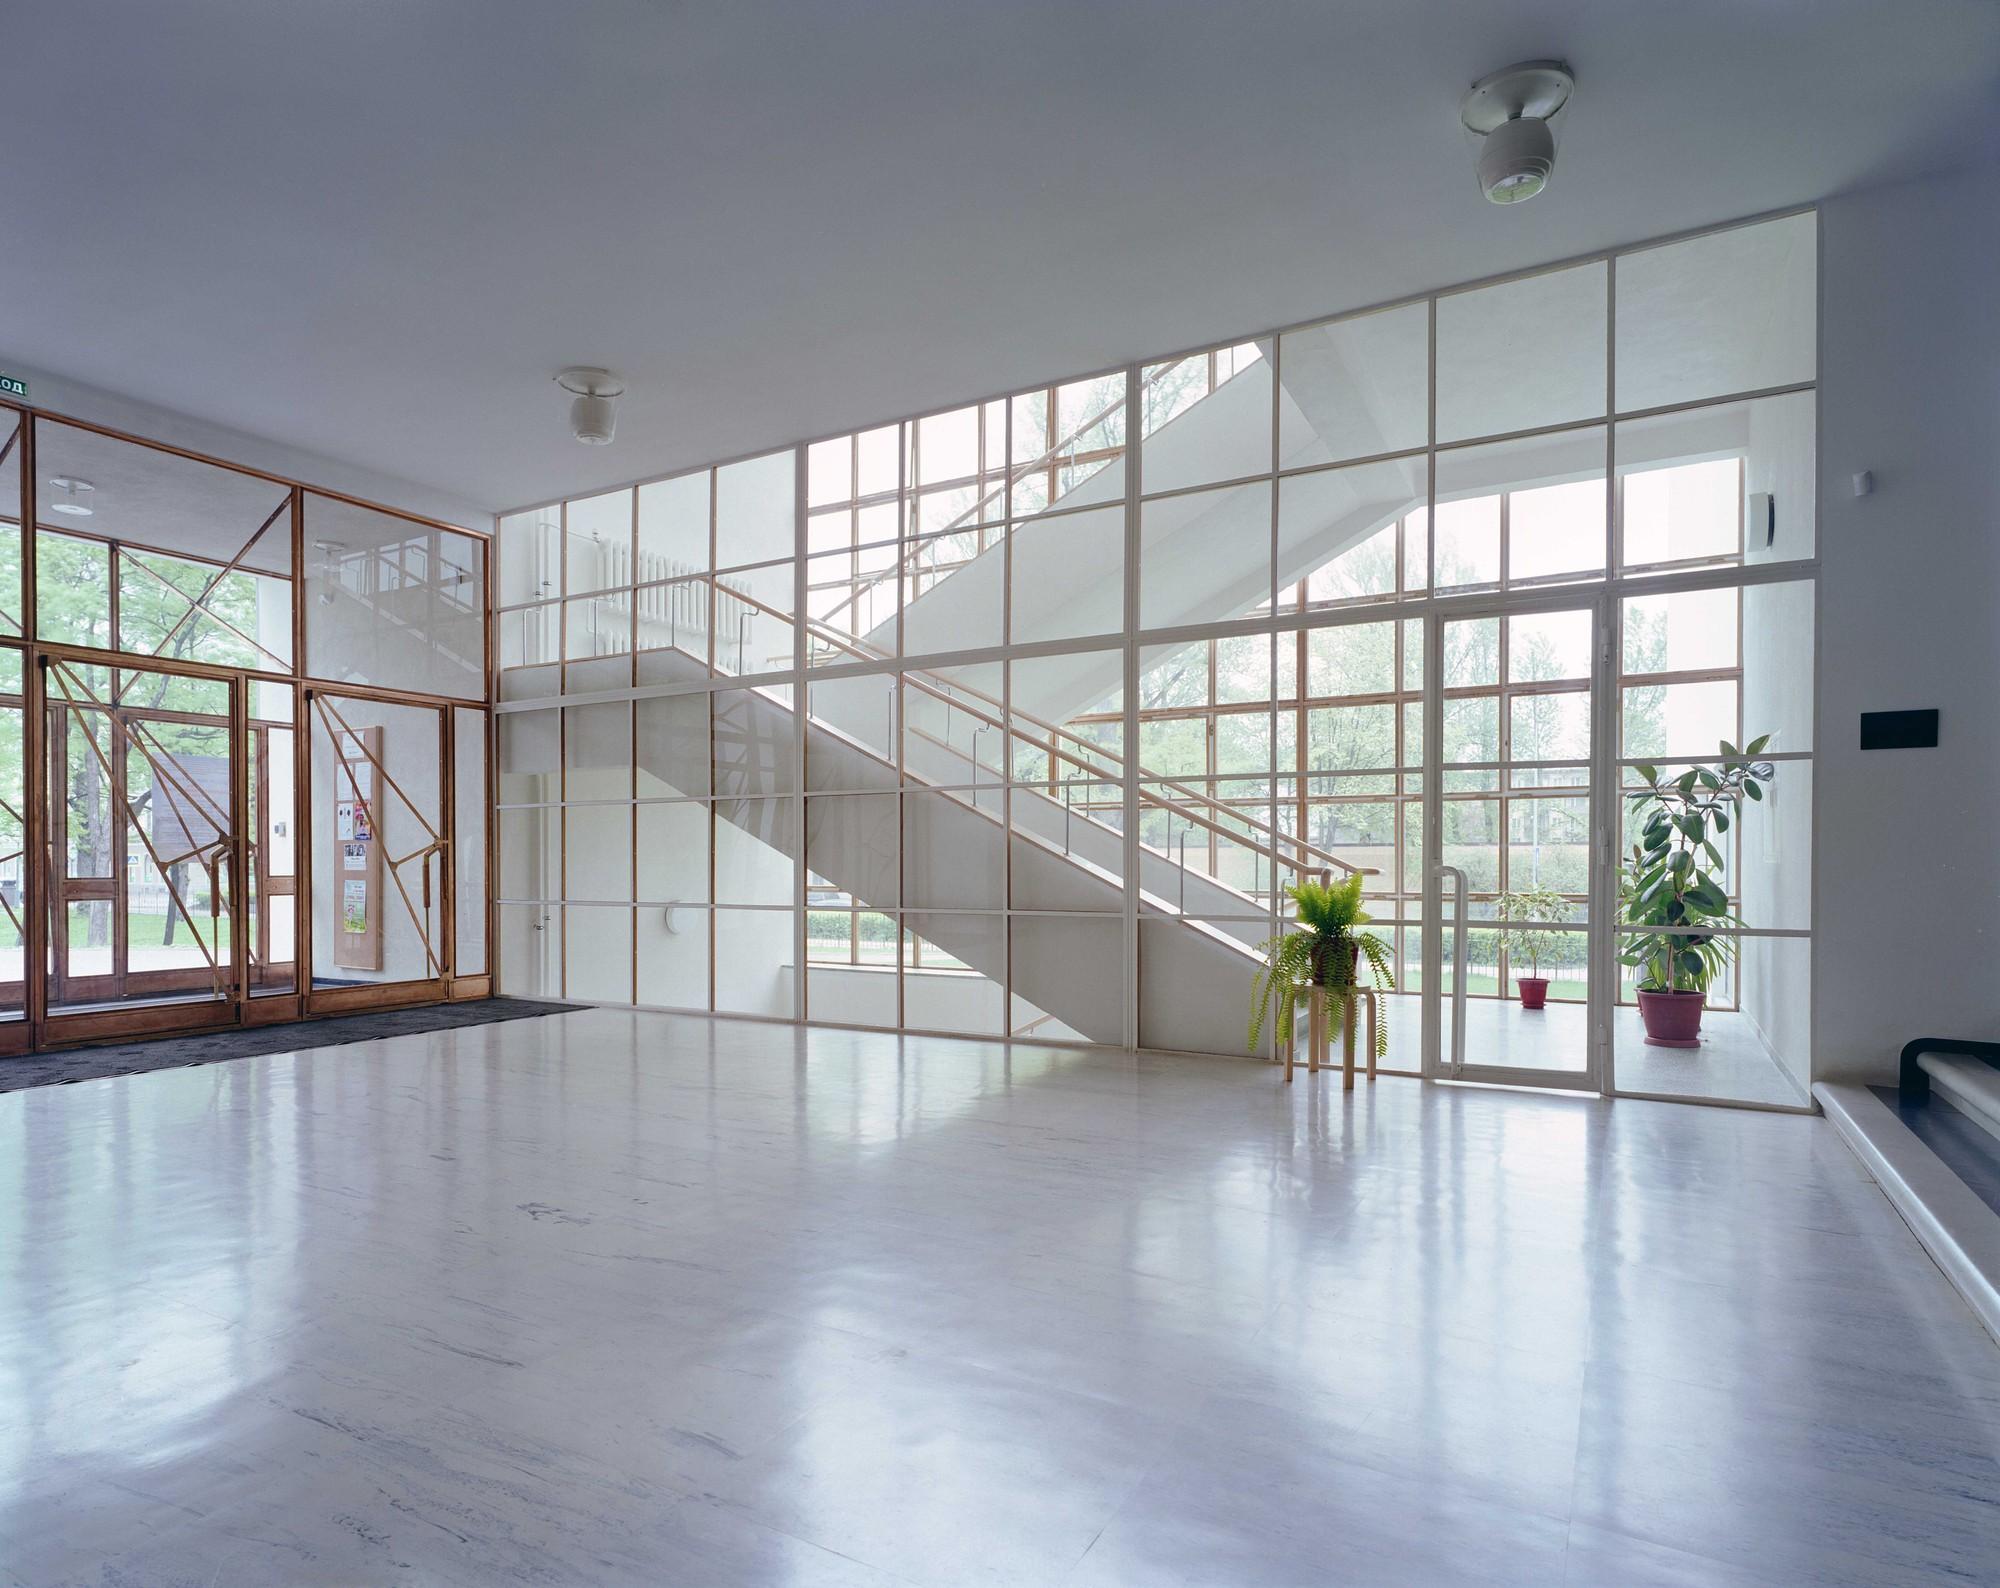 Cl Ef Bf Bd Windows  Restauration